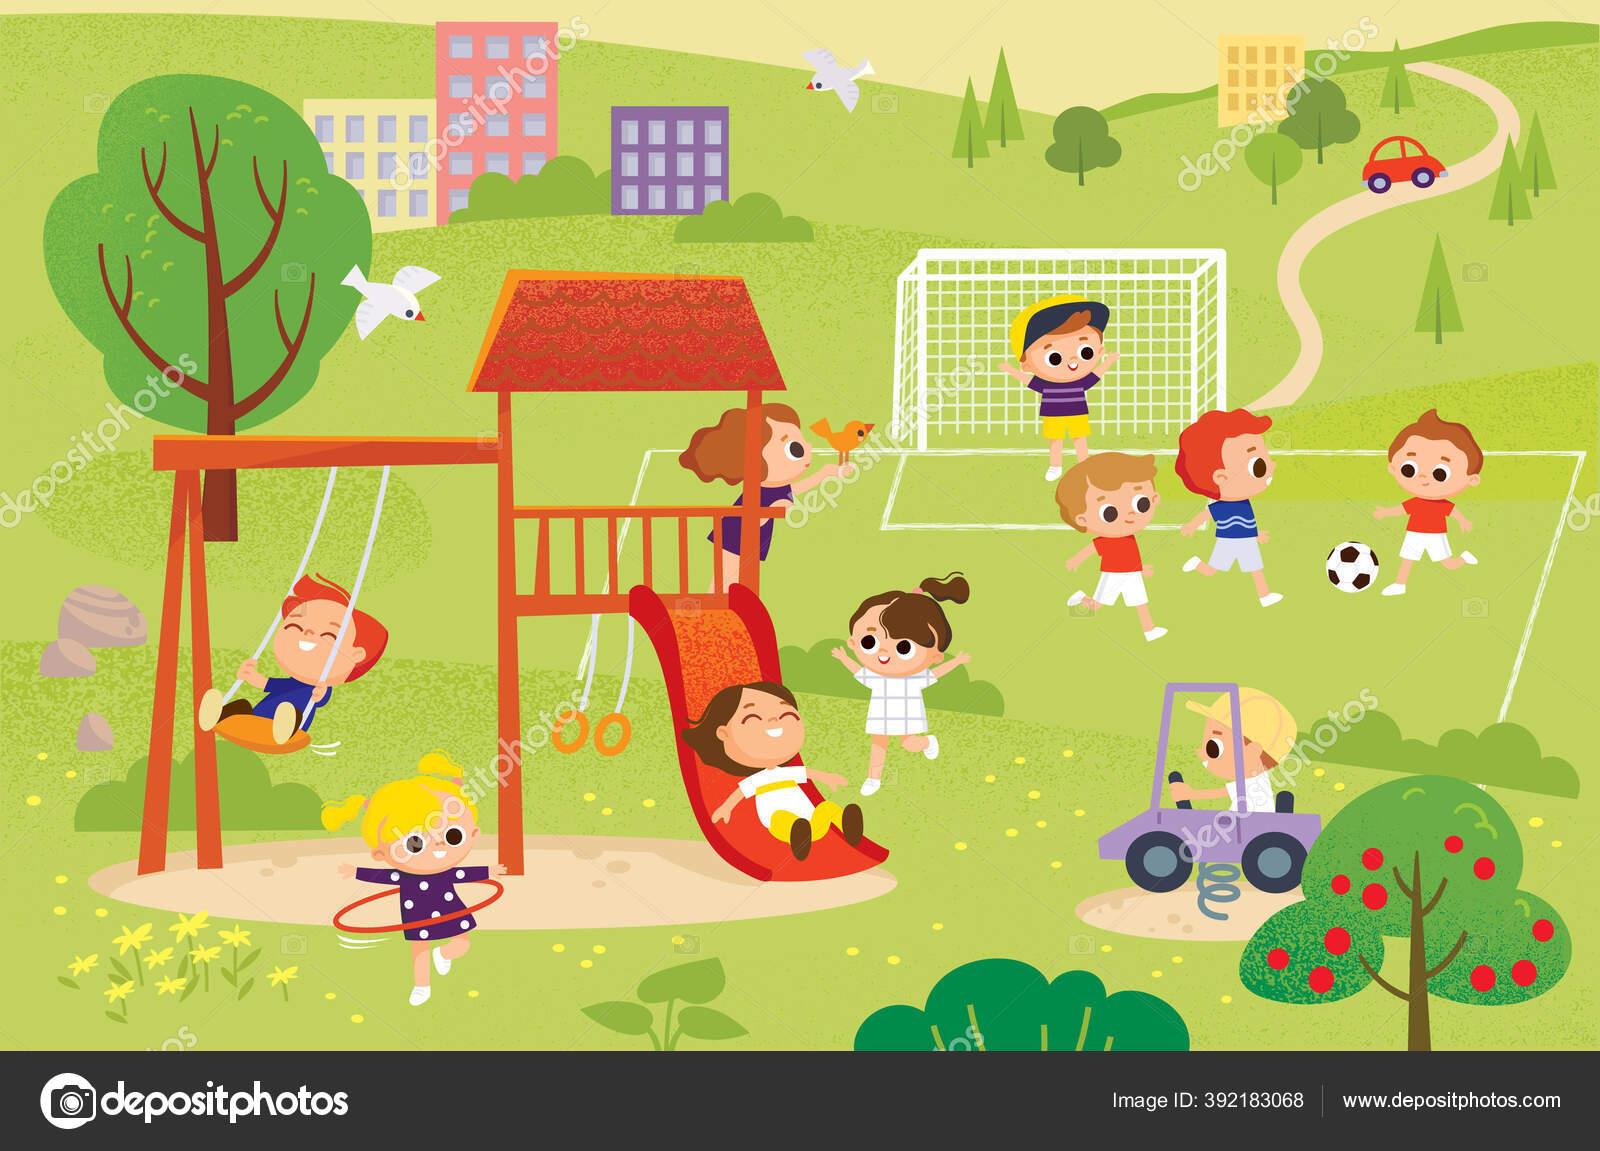 Gambar Ilustrasi Taman Bermain Anak Anak Bermain Taman Bermain Menghabiskan Waktu Dalam Permainan